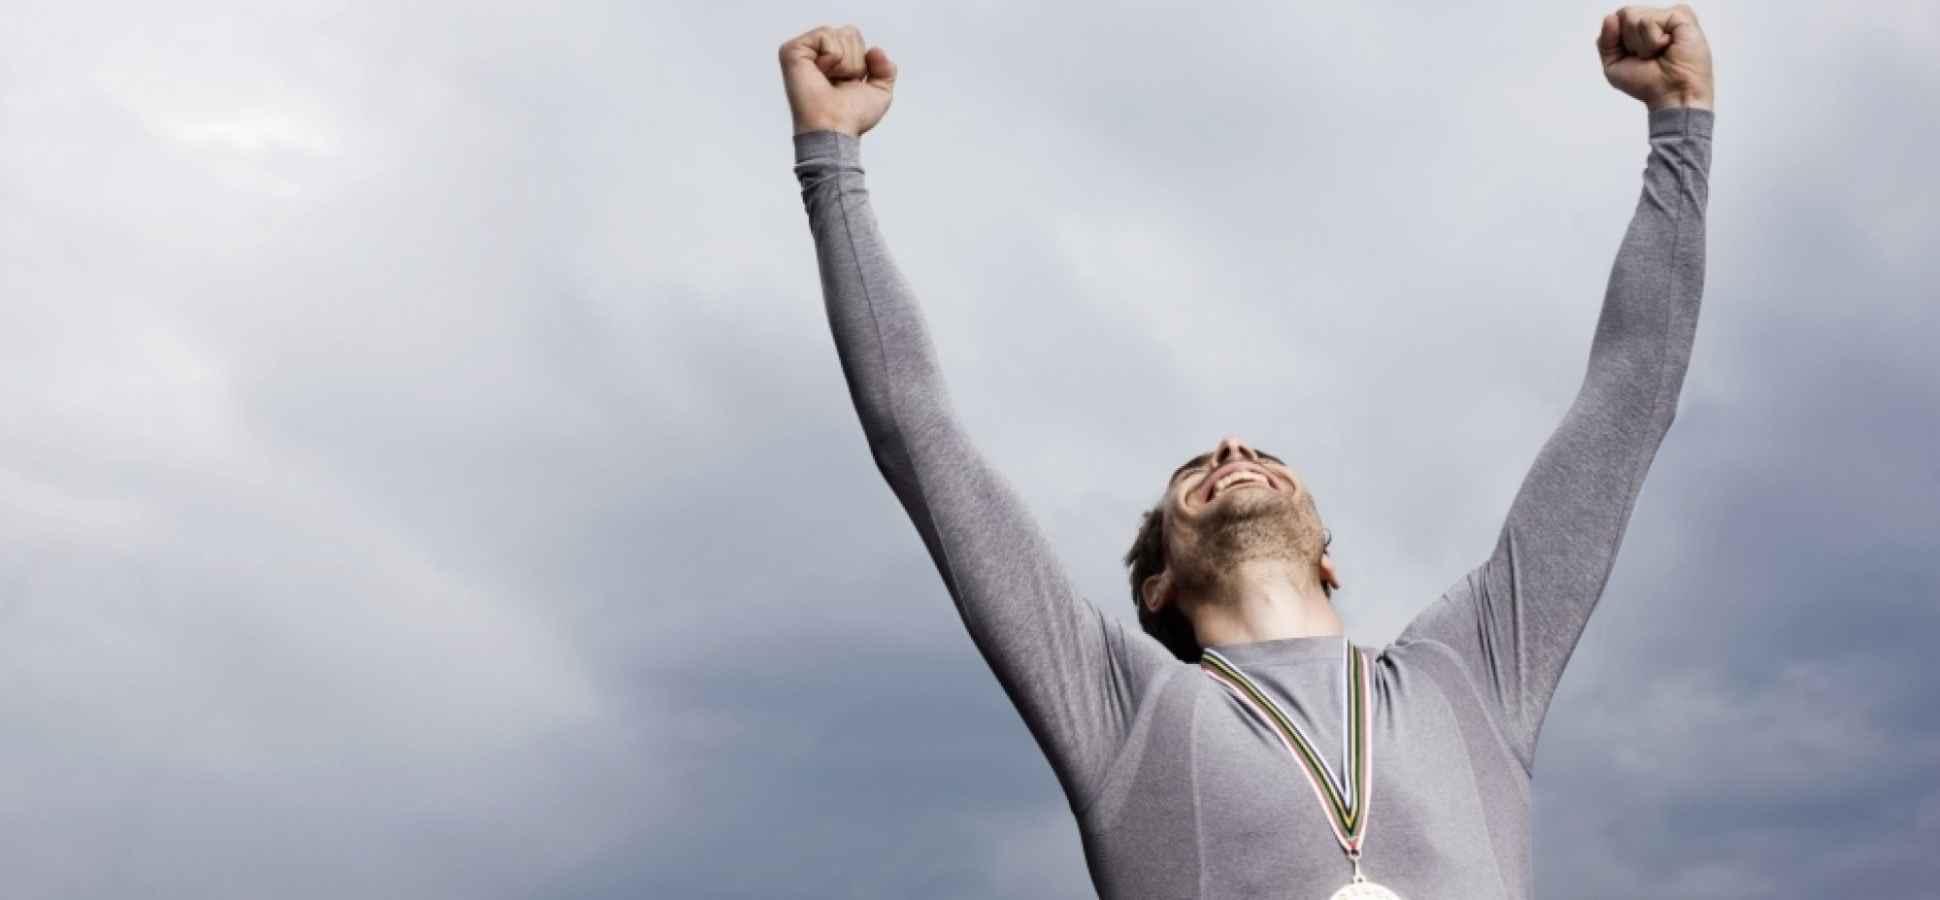 8 Habits of the Super Successful